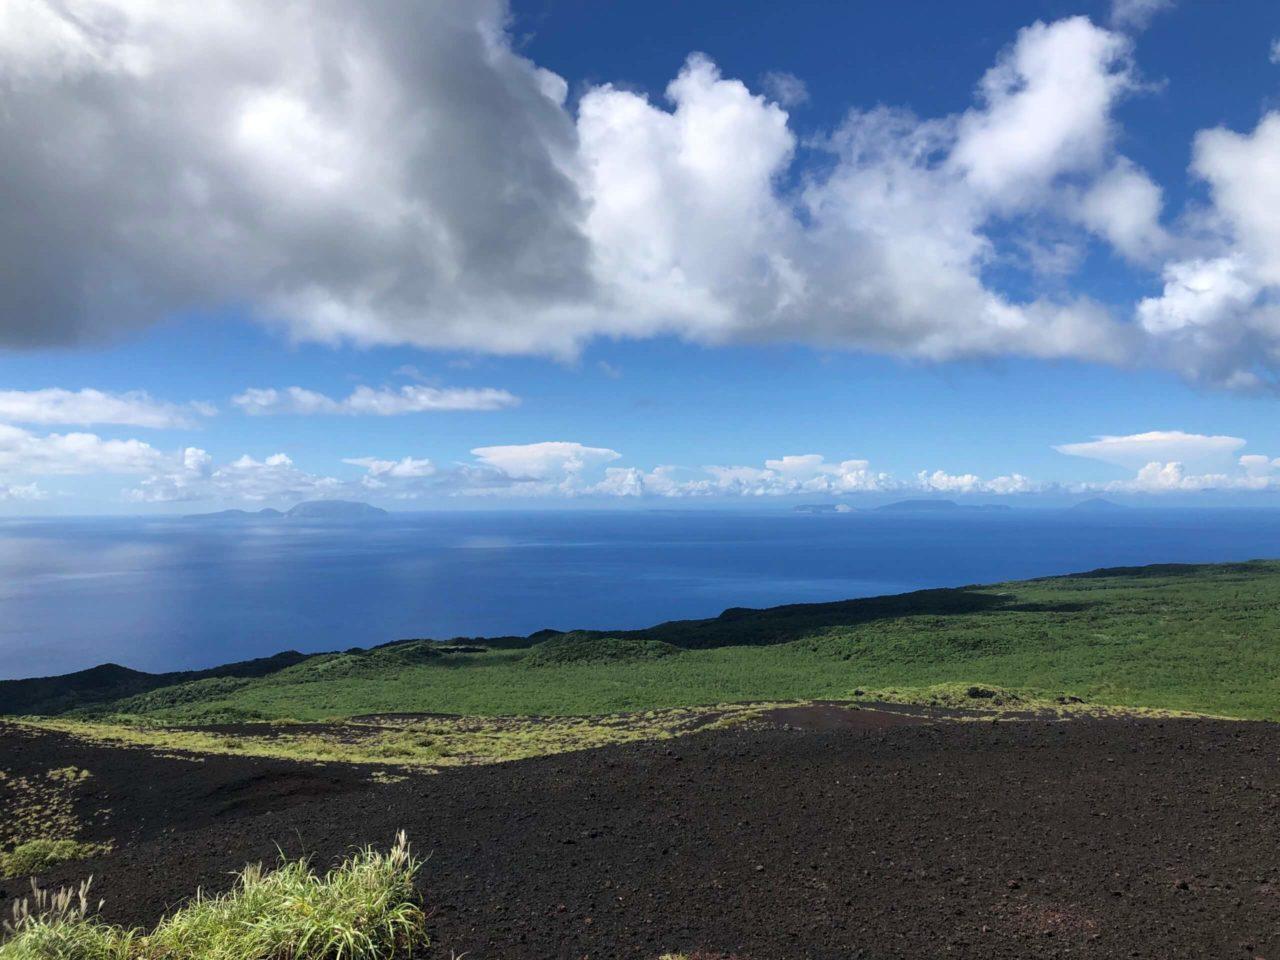 IMG 7252 scaled - 【東京 三宅島】海、火山、星。最高の自然を満喫しよう!